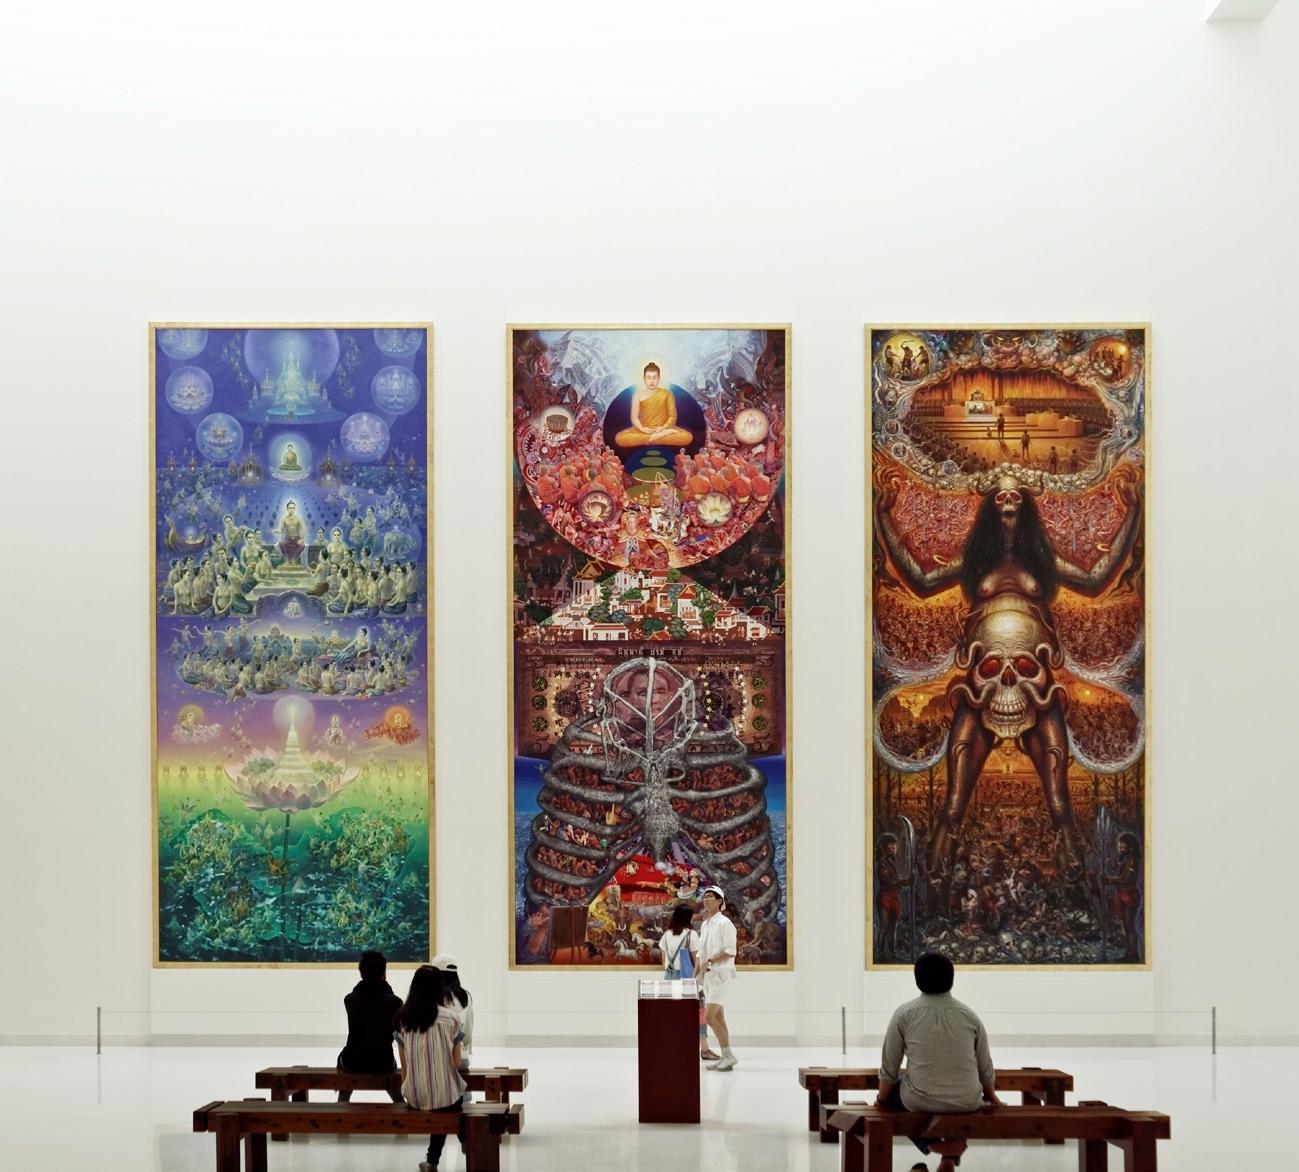 Museum of Contemporary Art - MOCA